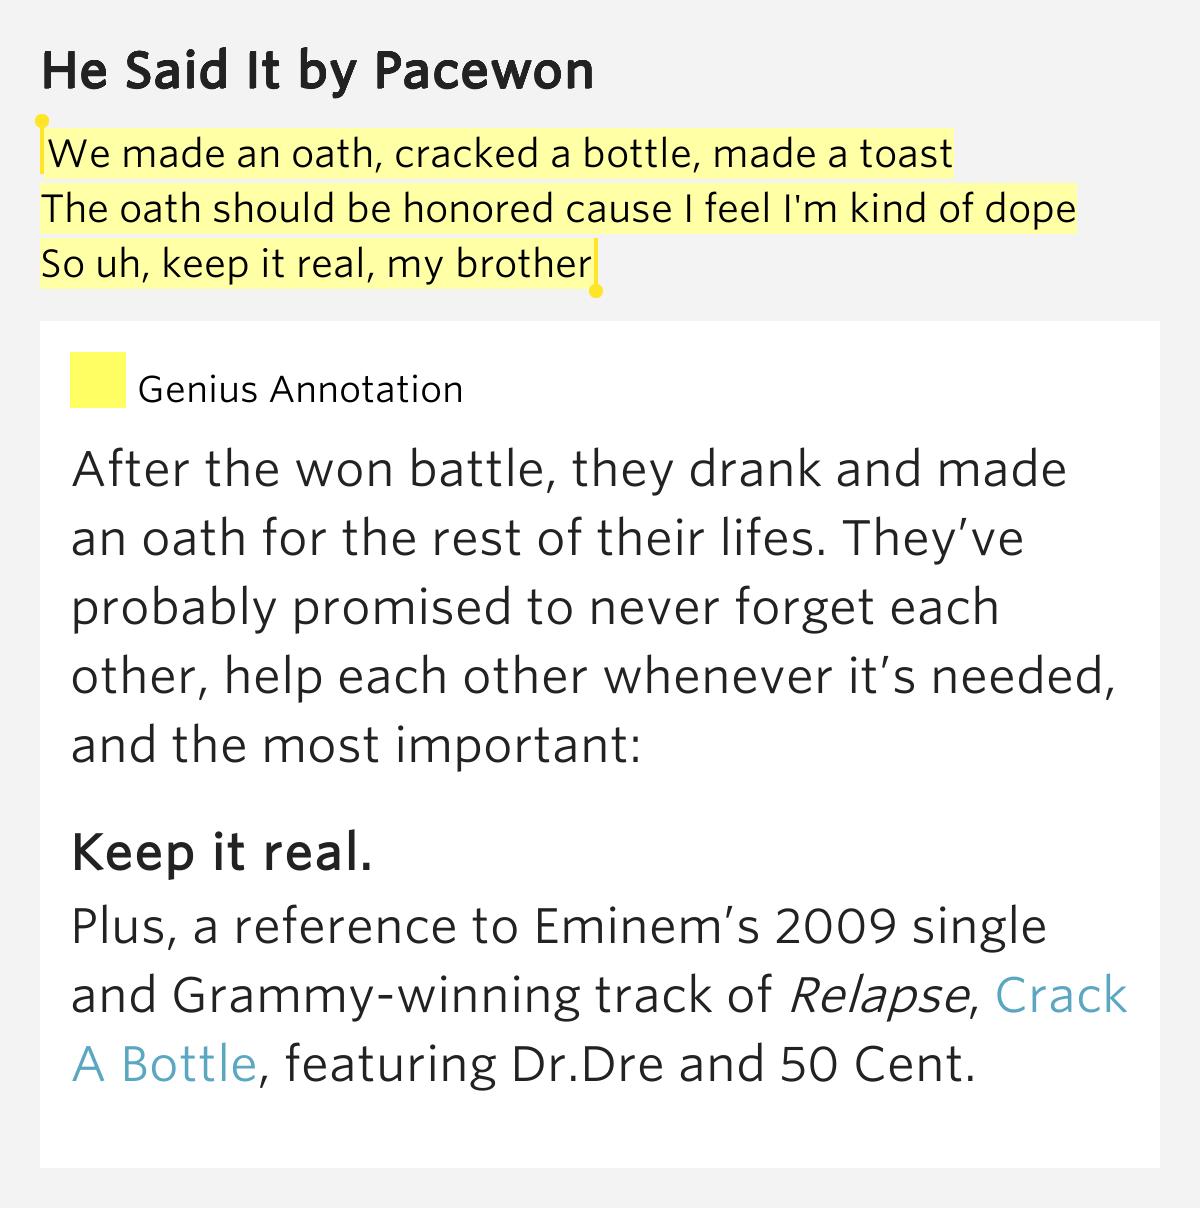 Bottom of the bottle lyrics